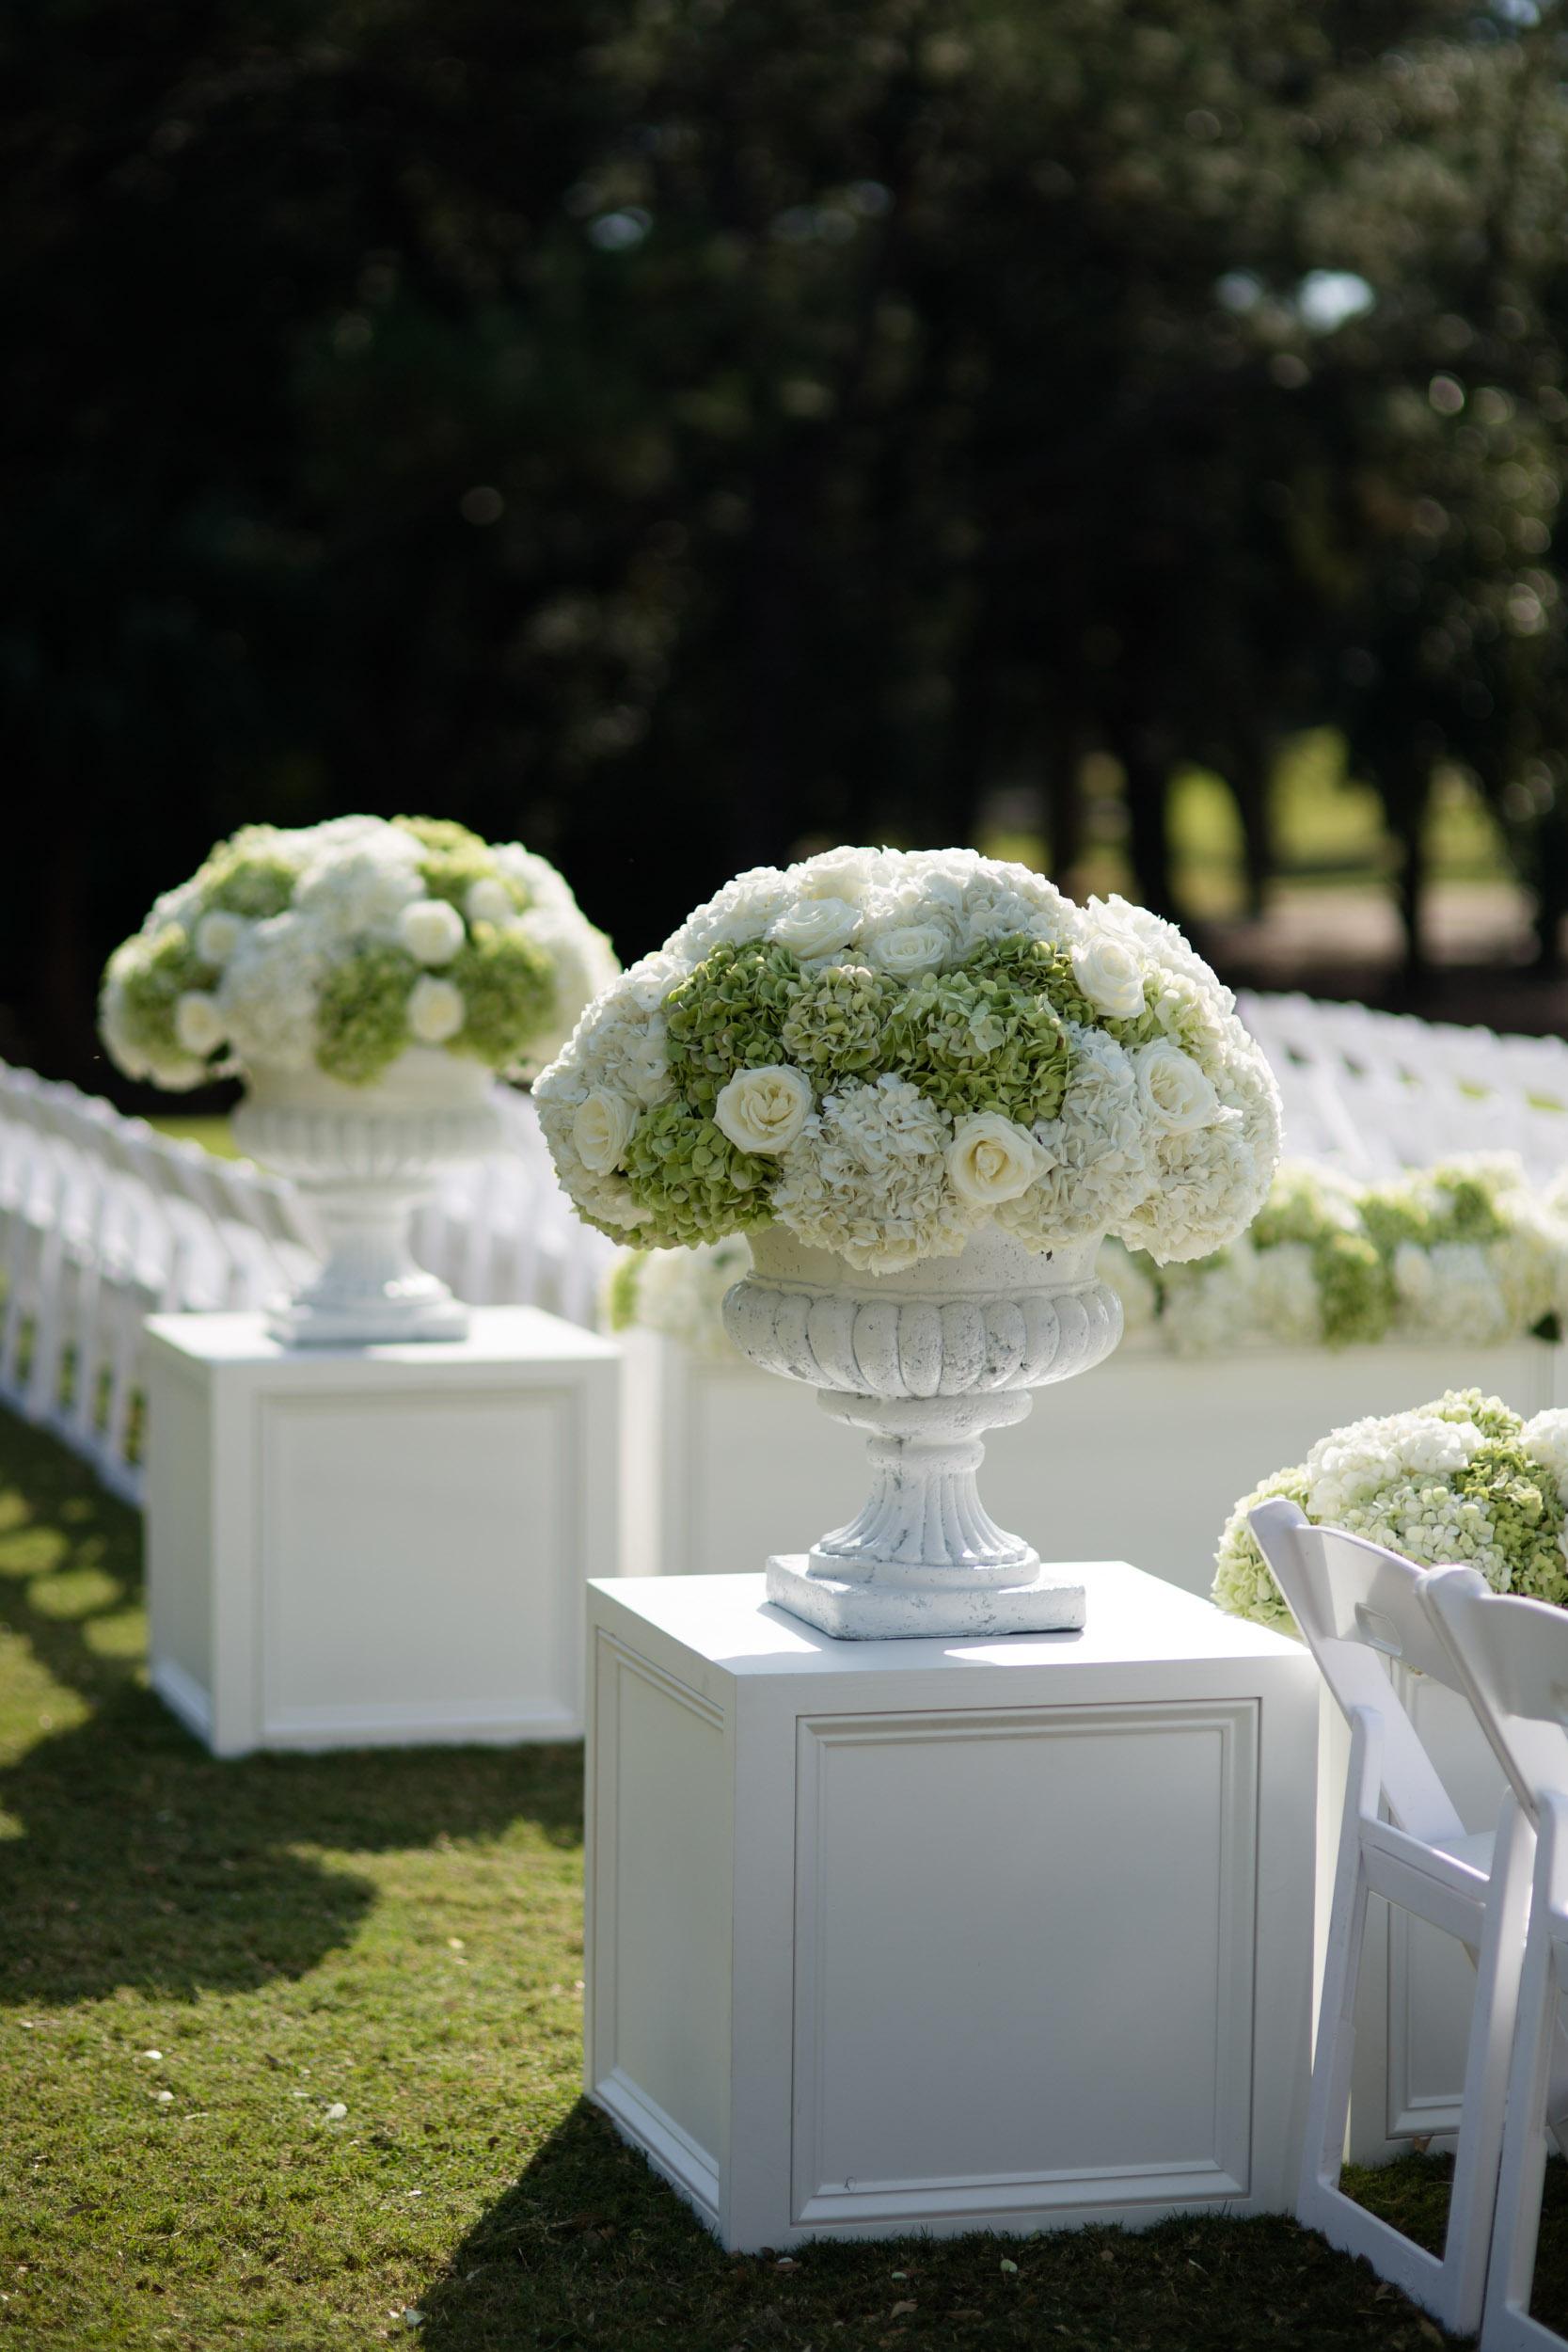 kiawah island wedding ceremony decor with hydrangeas and roses